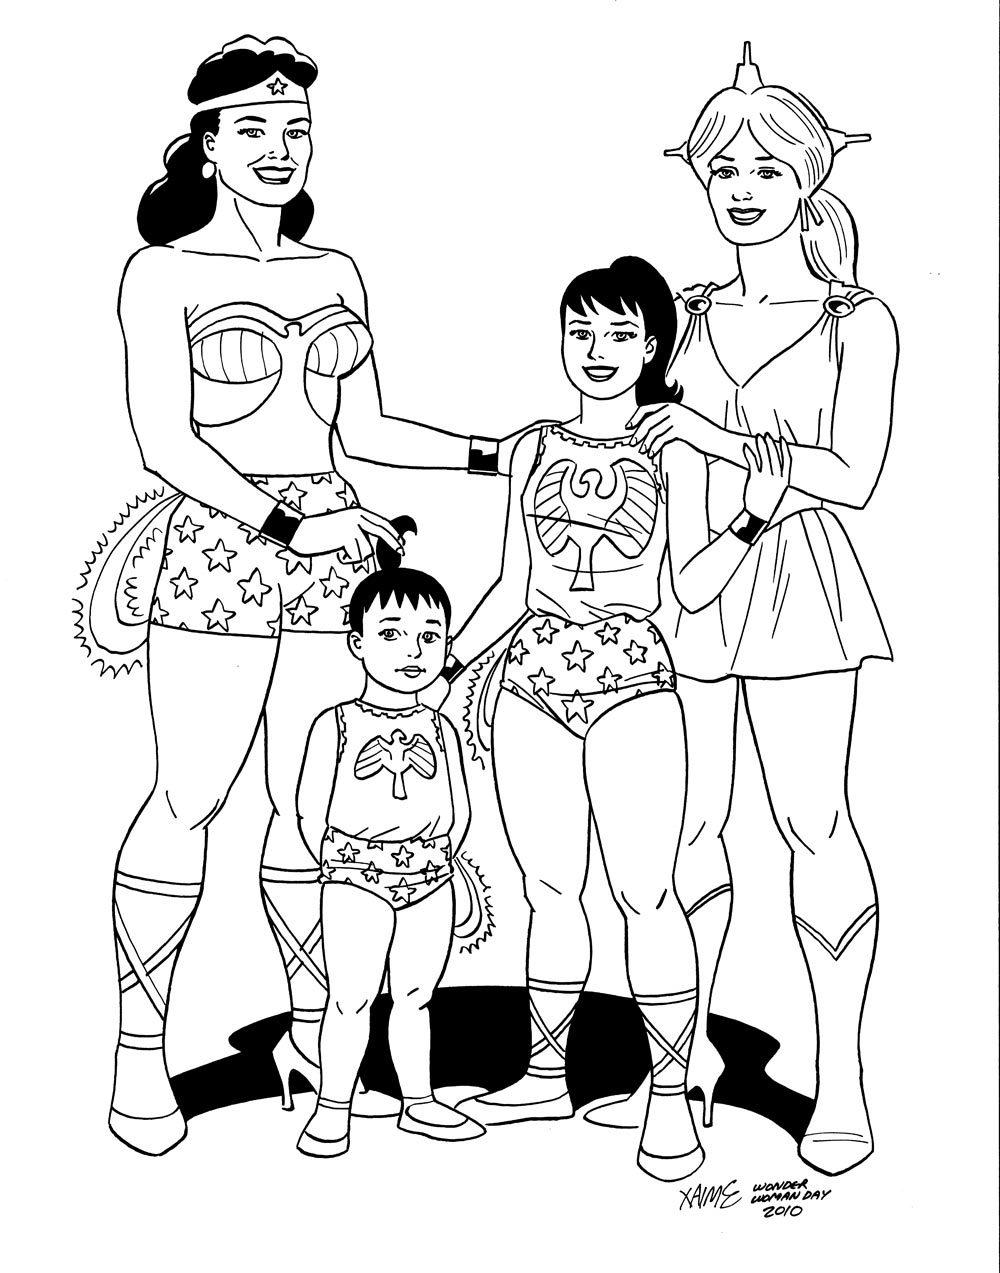 Jaime Hernandez does Wonder Woman. #DCWomen